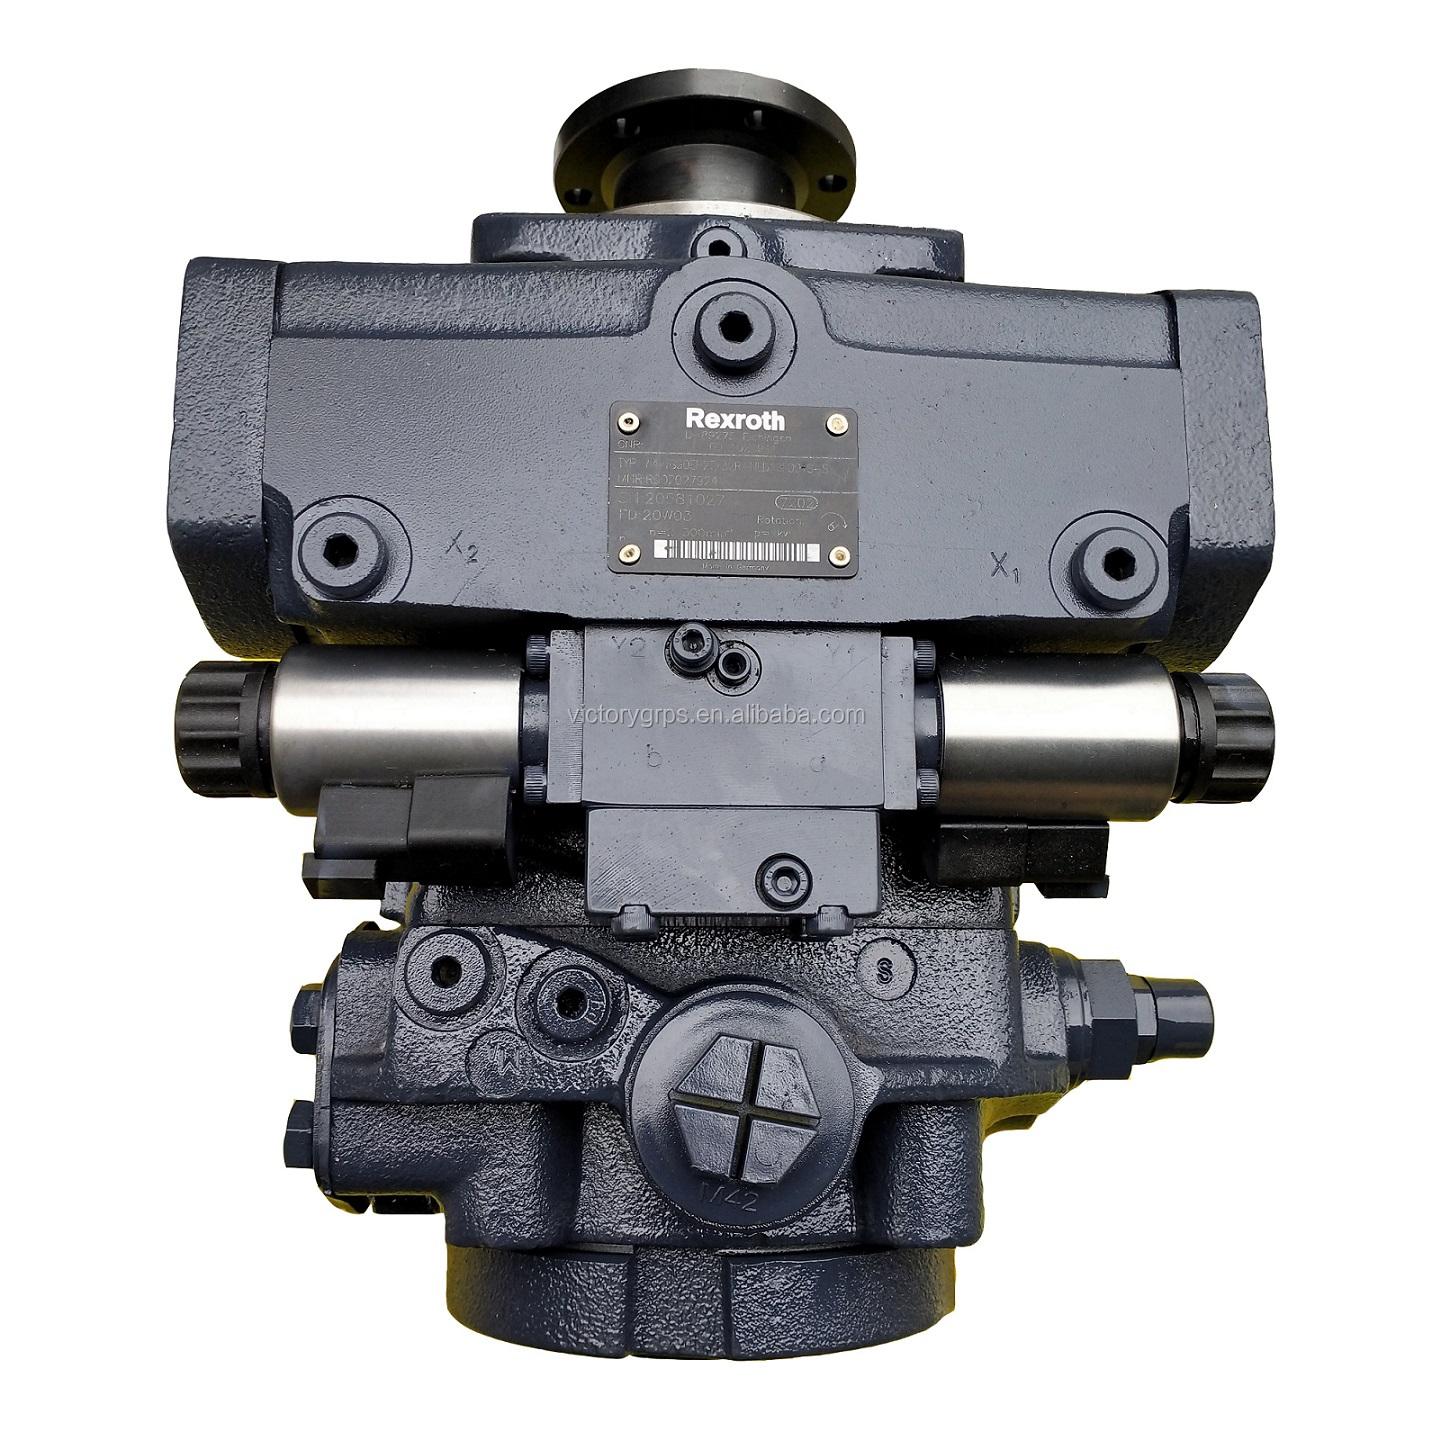 Hydromatik A4VTG71 A4VTG90 Rexroth Axial Piston Concrete Mixer Pump